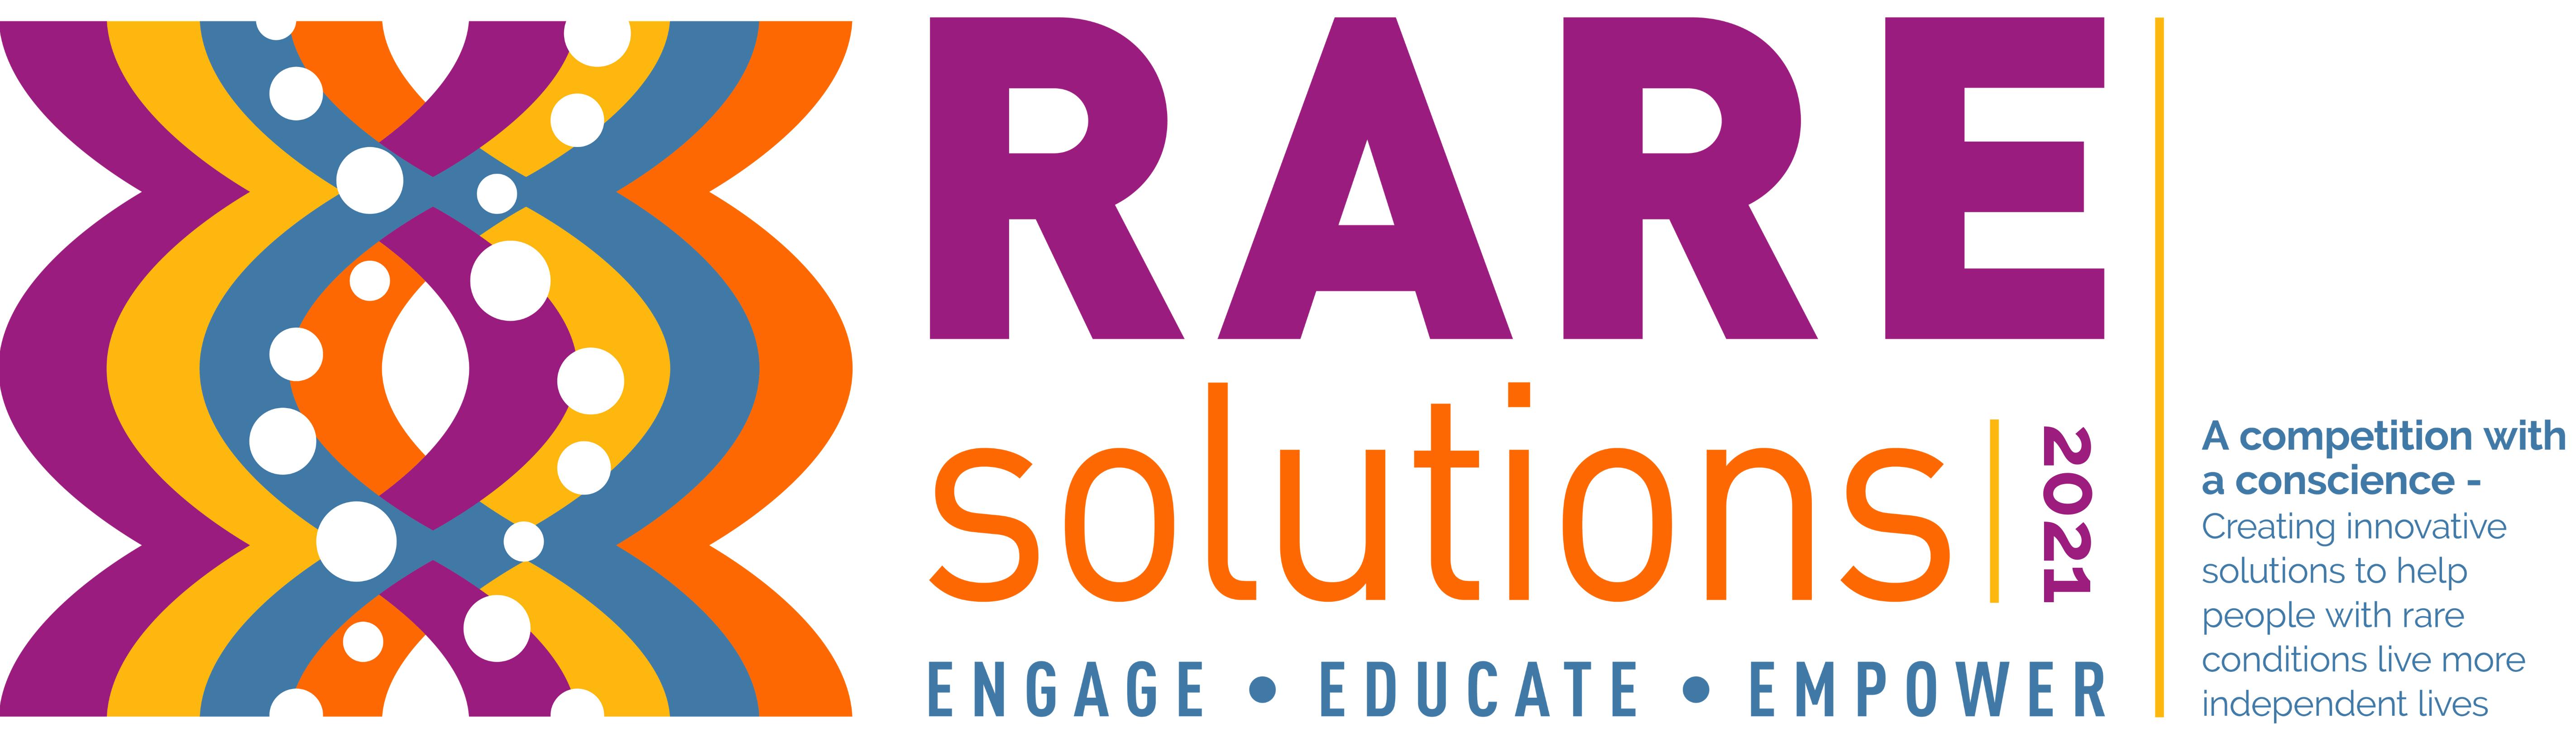 RAREsolutions20 poster design competition logo